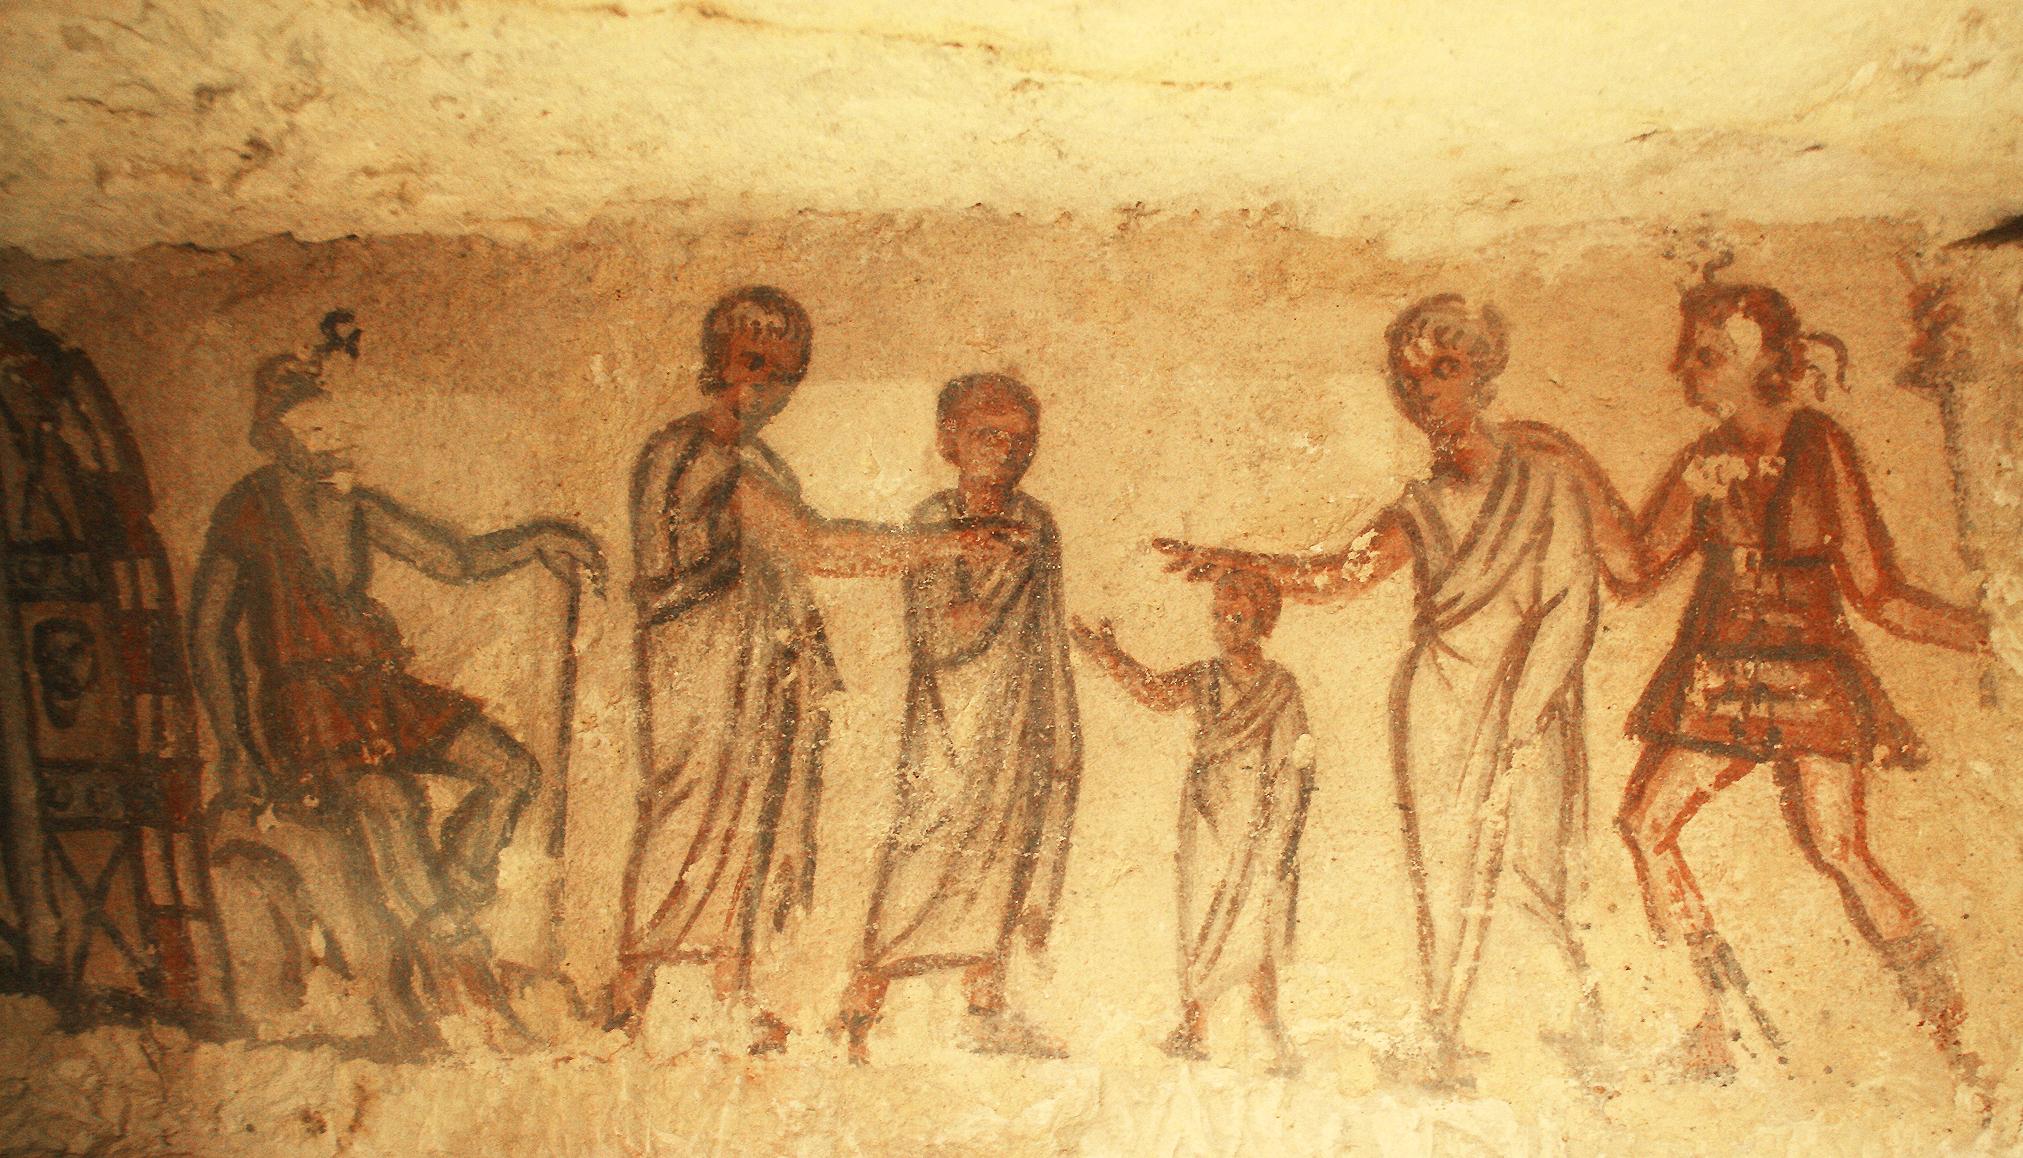 Death scene, Tomba 5636, Tarquinia